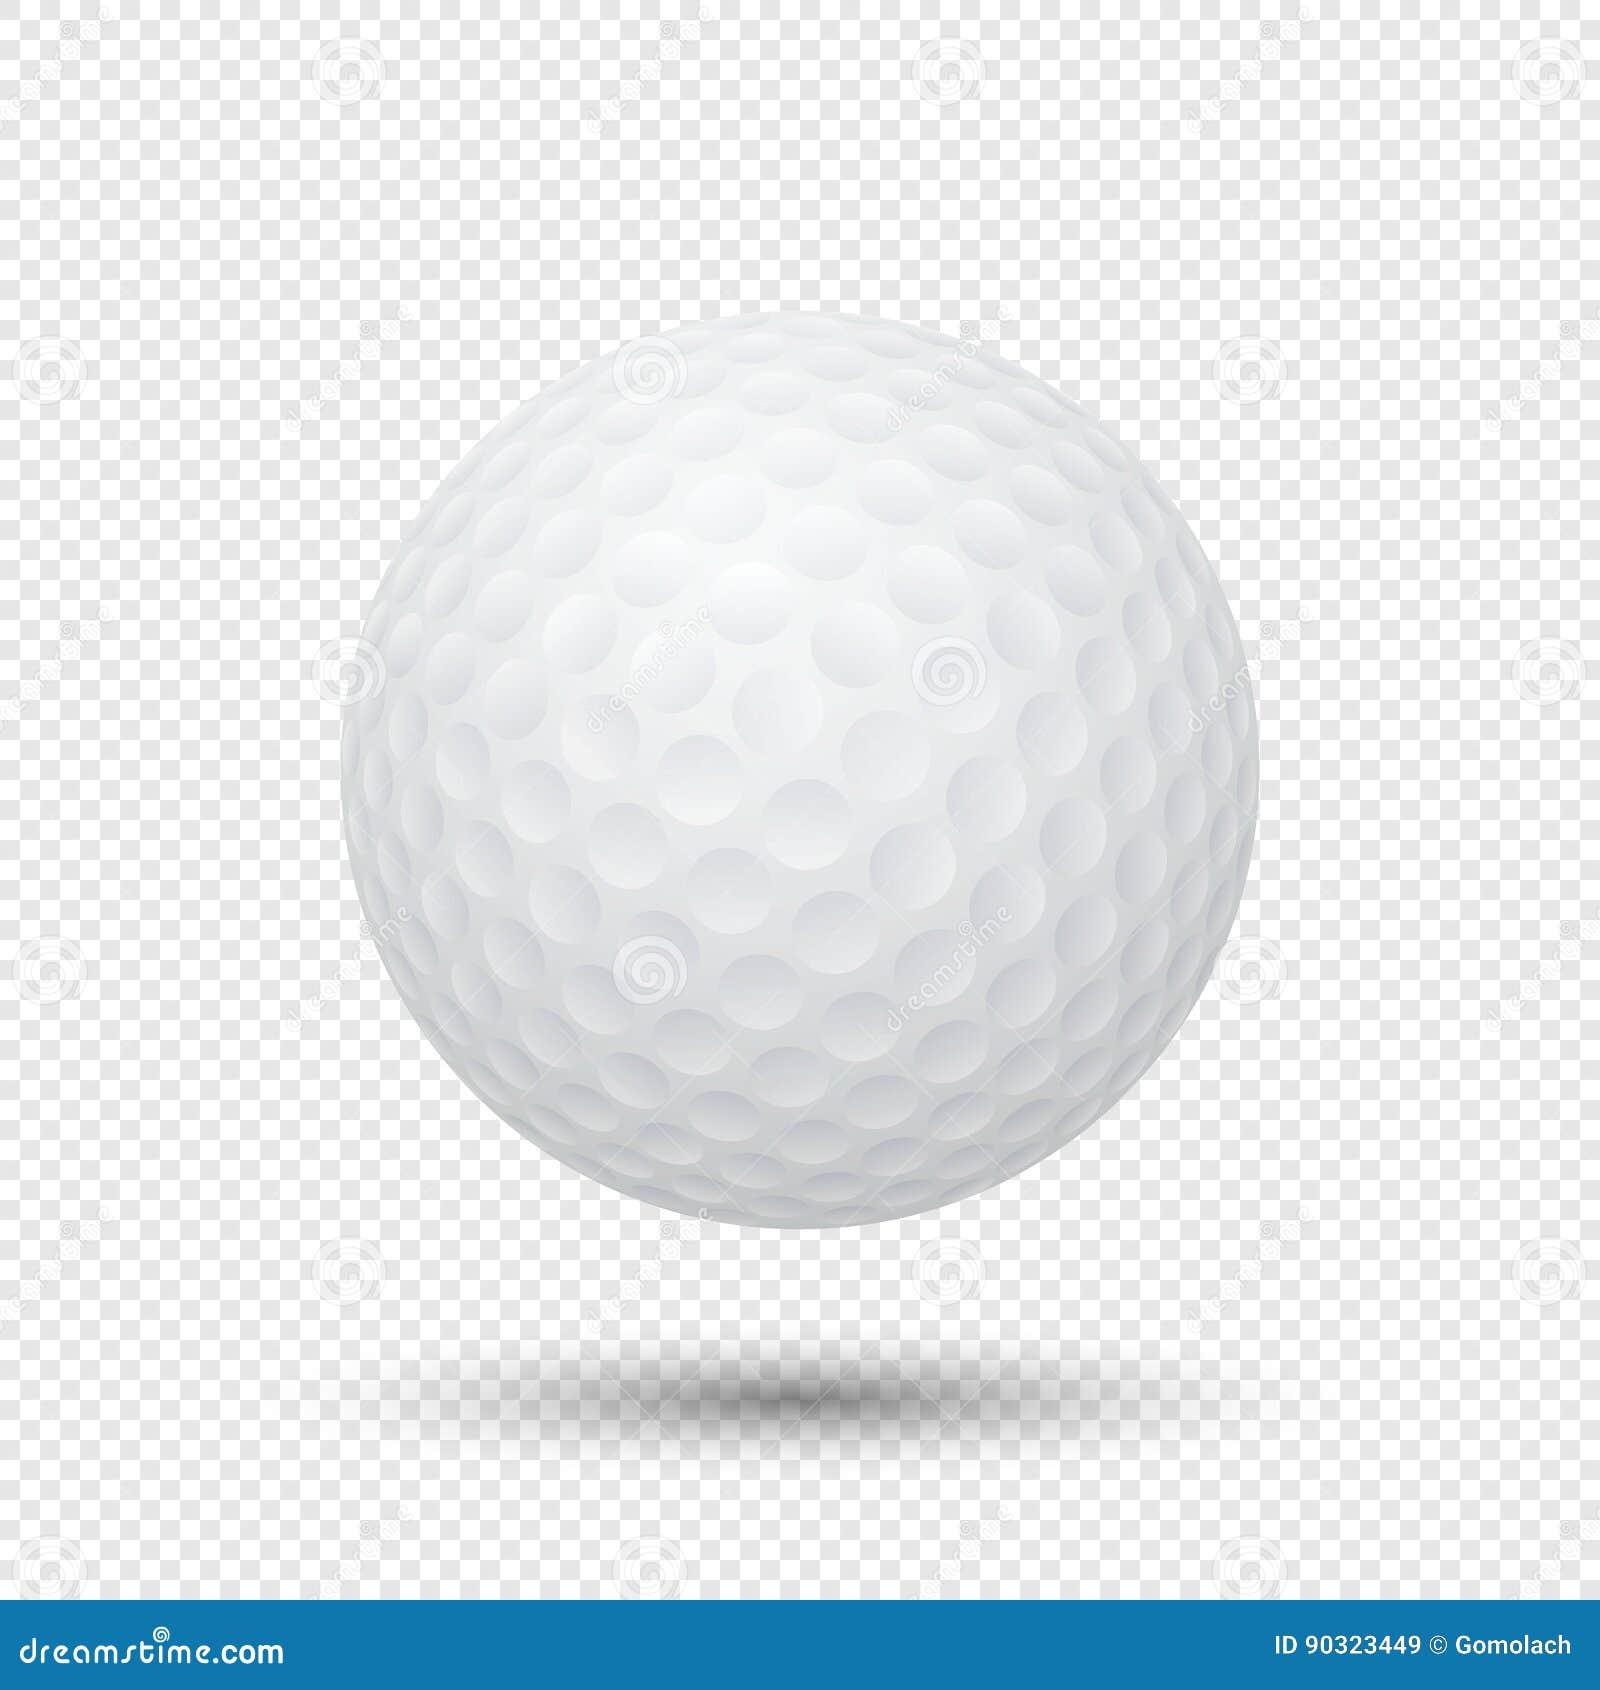 flying golf ball stock illustrations 276 flying golf ball stock rh dreamstime com Silhouette Vector Golf Balls Golf Flag Vector